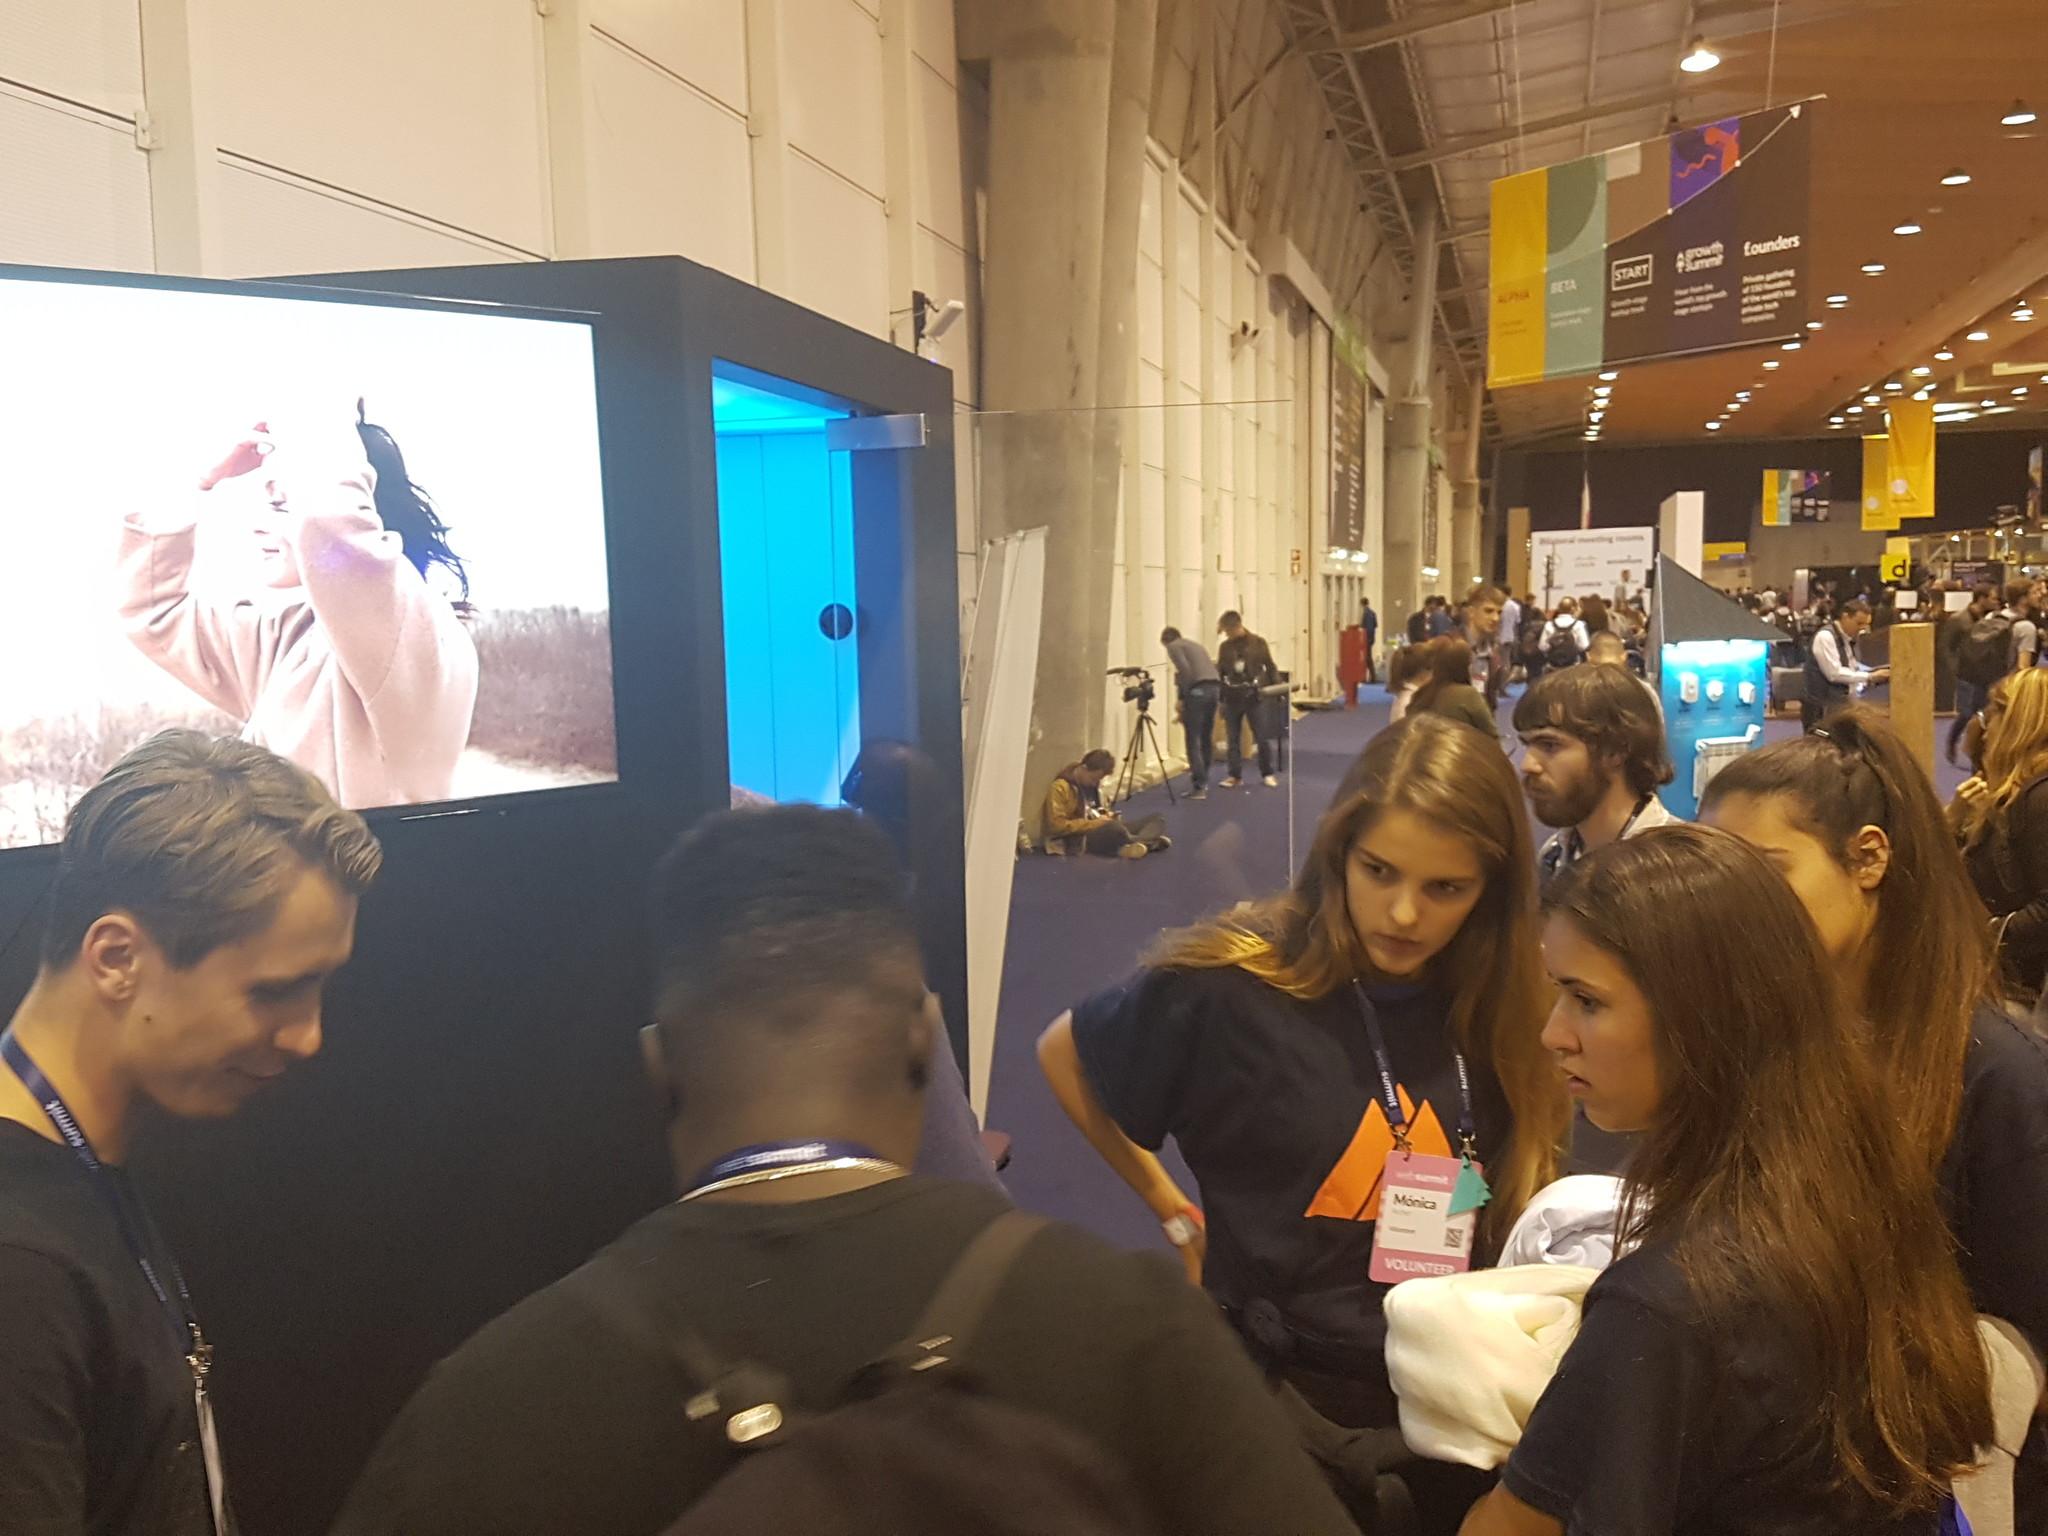 websummit virtual reality augmented reality sensiks event 1